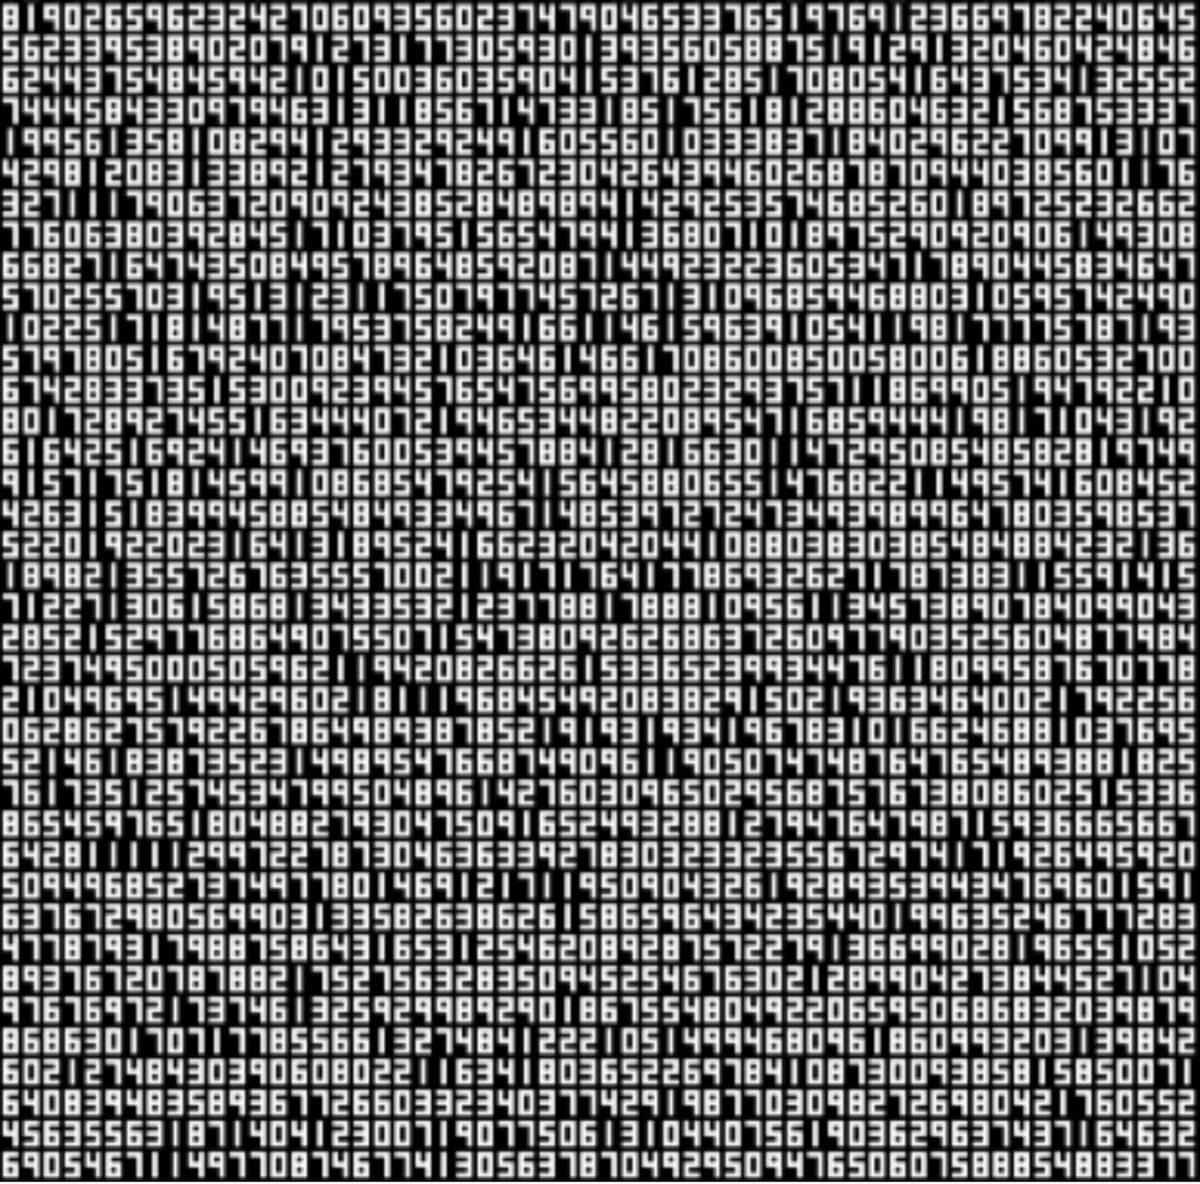 Ryoji Ikeda, A Single Number That Has 10,000,086 Digits, 2021